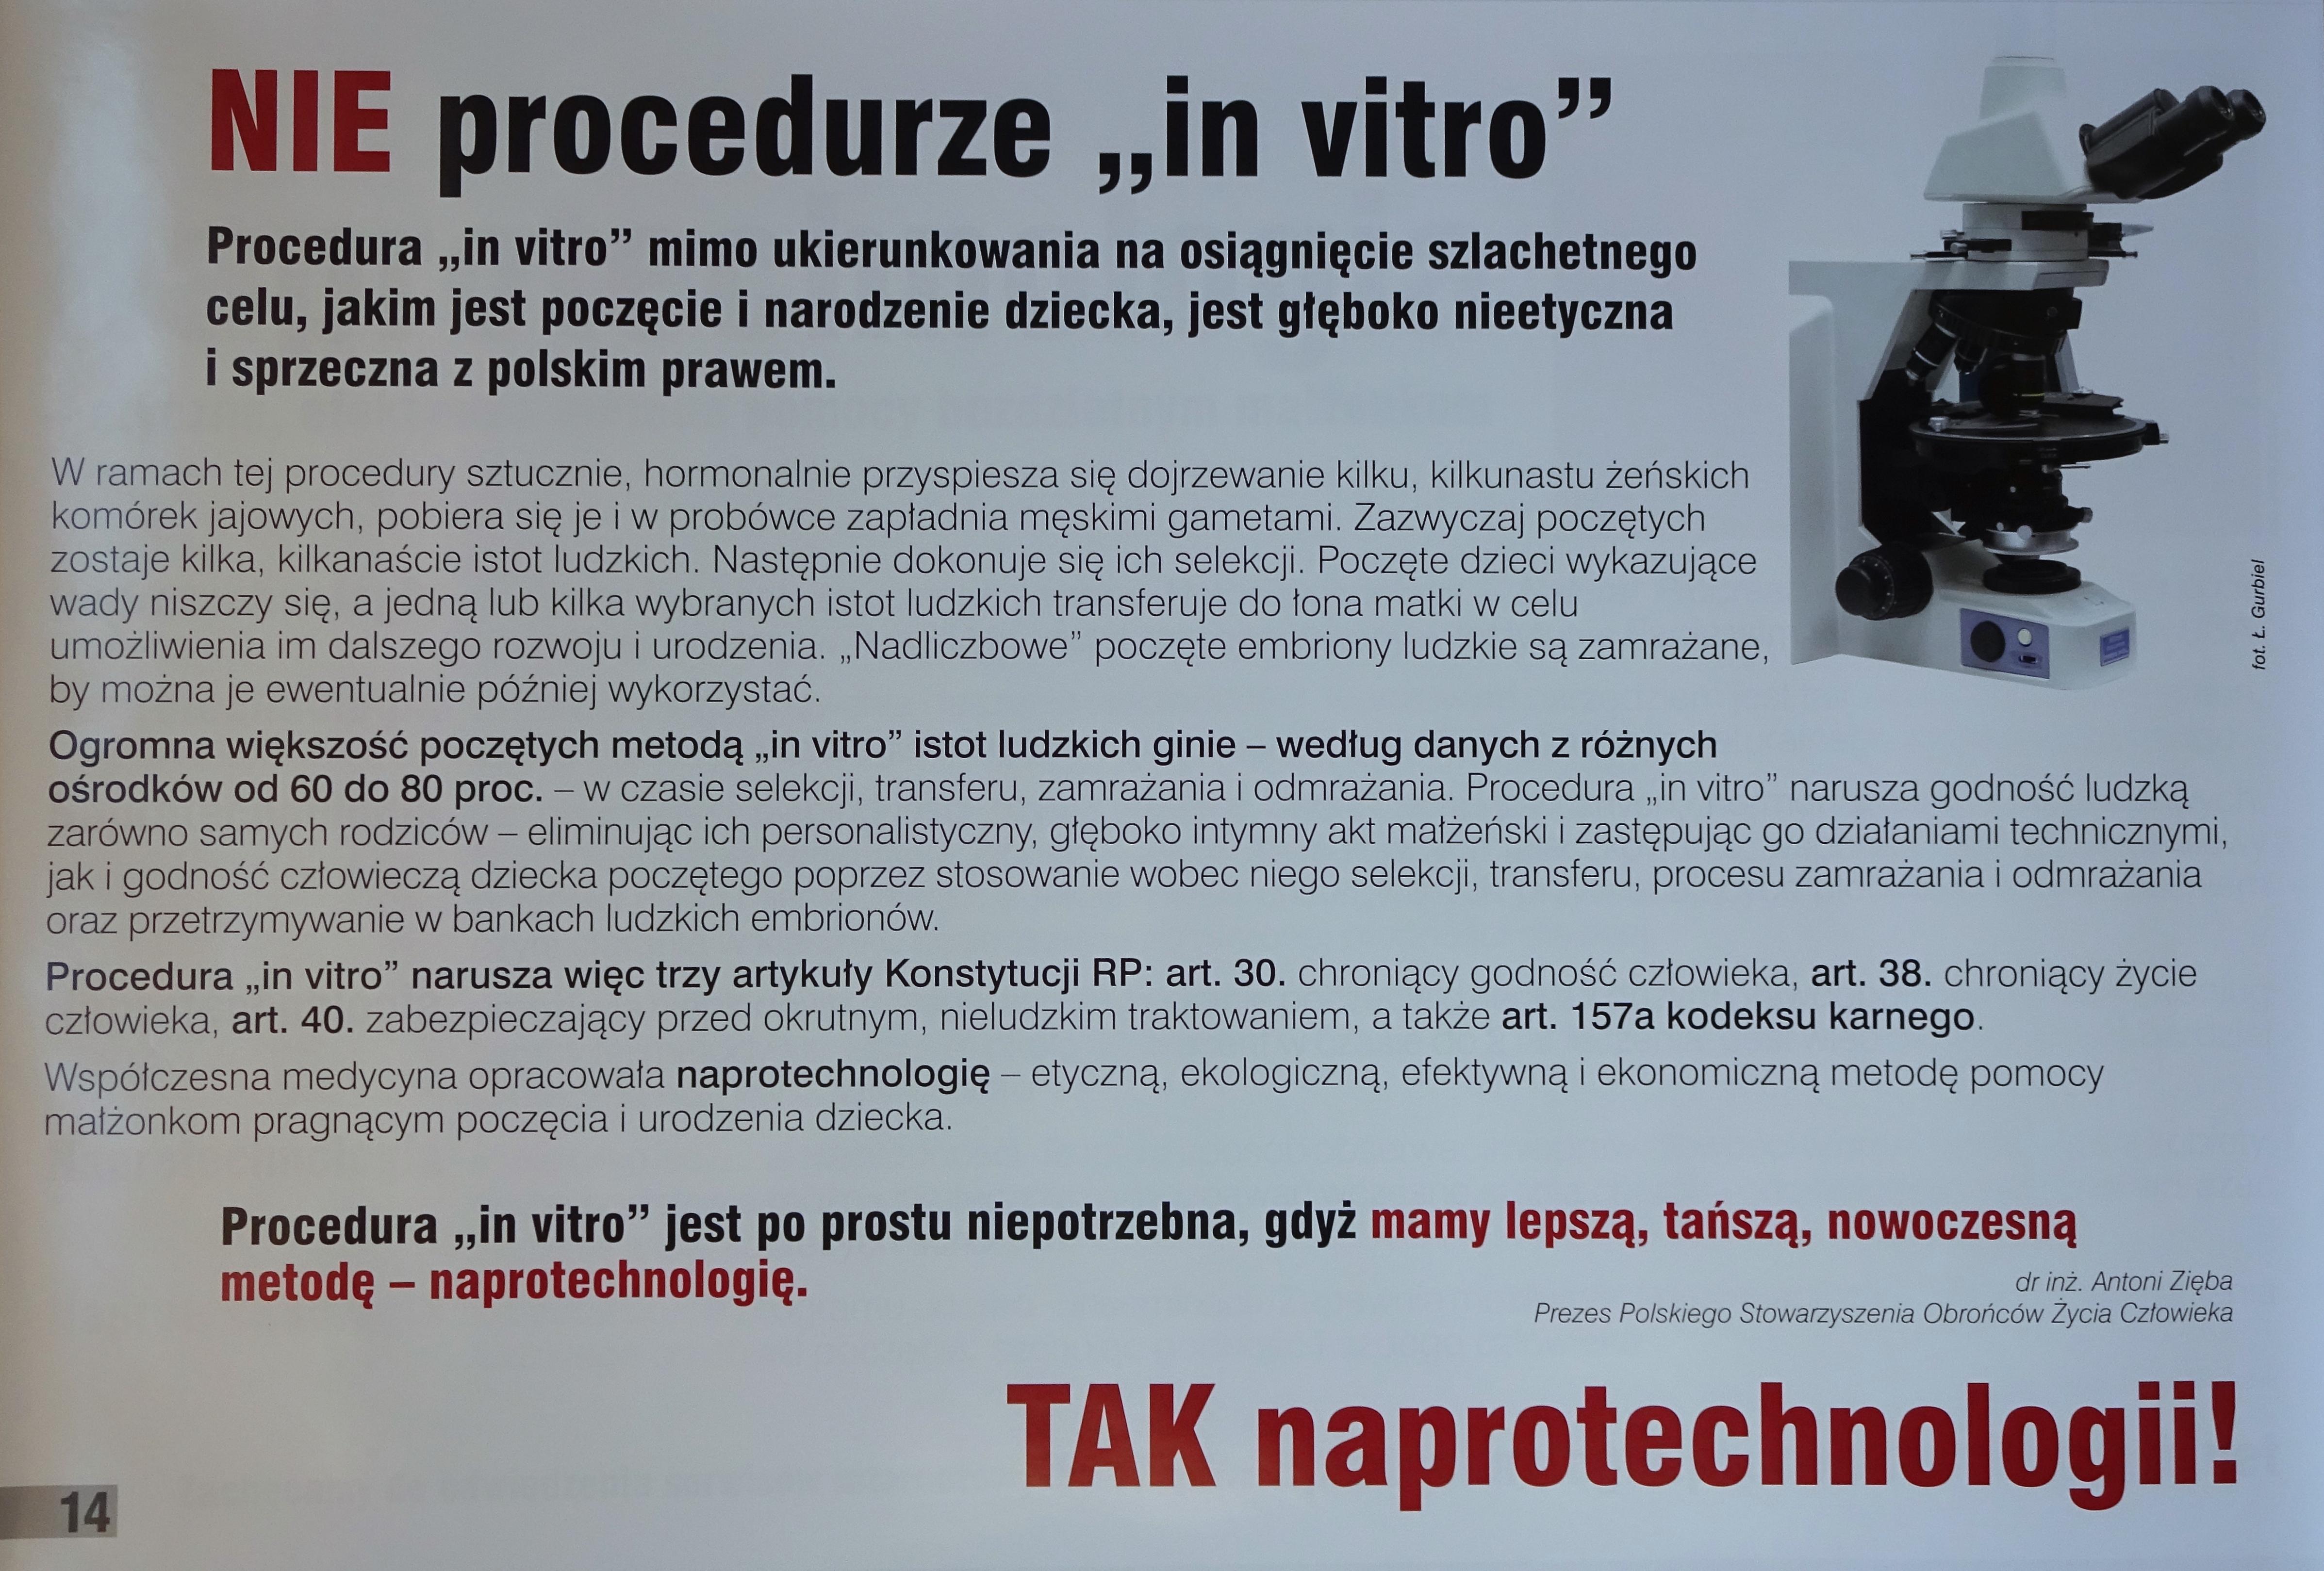 Naprotechnologia-tak.